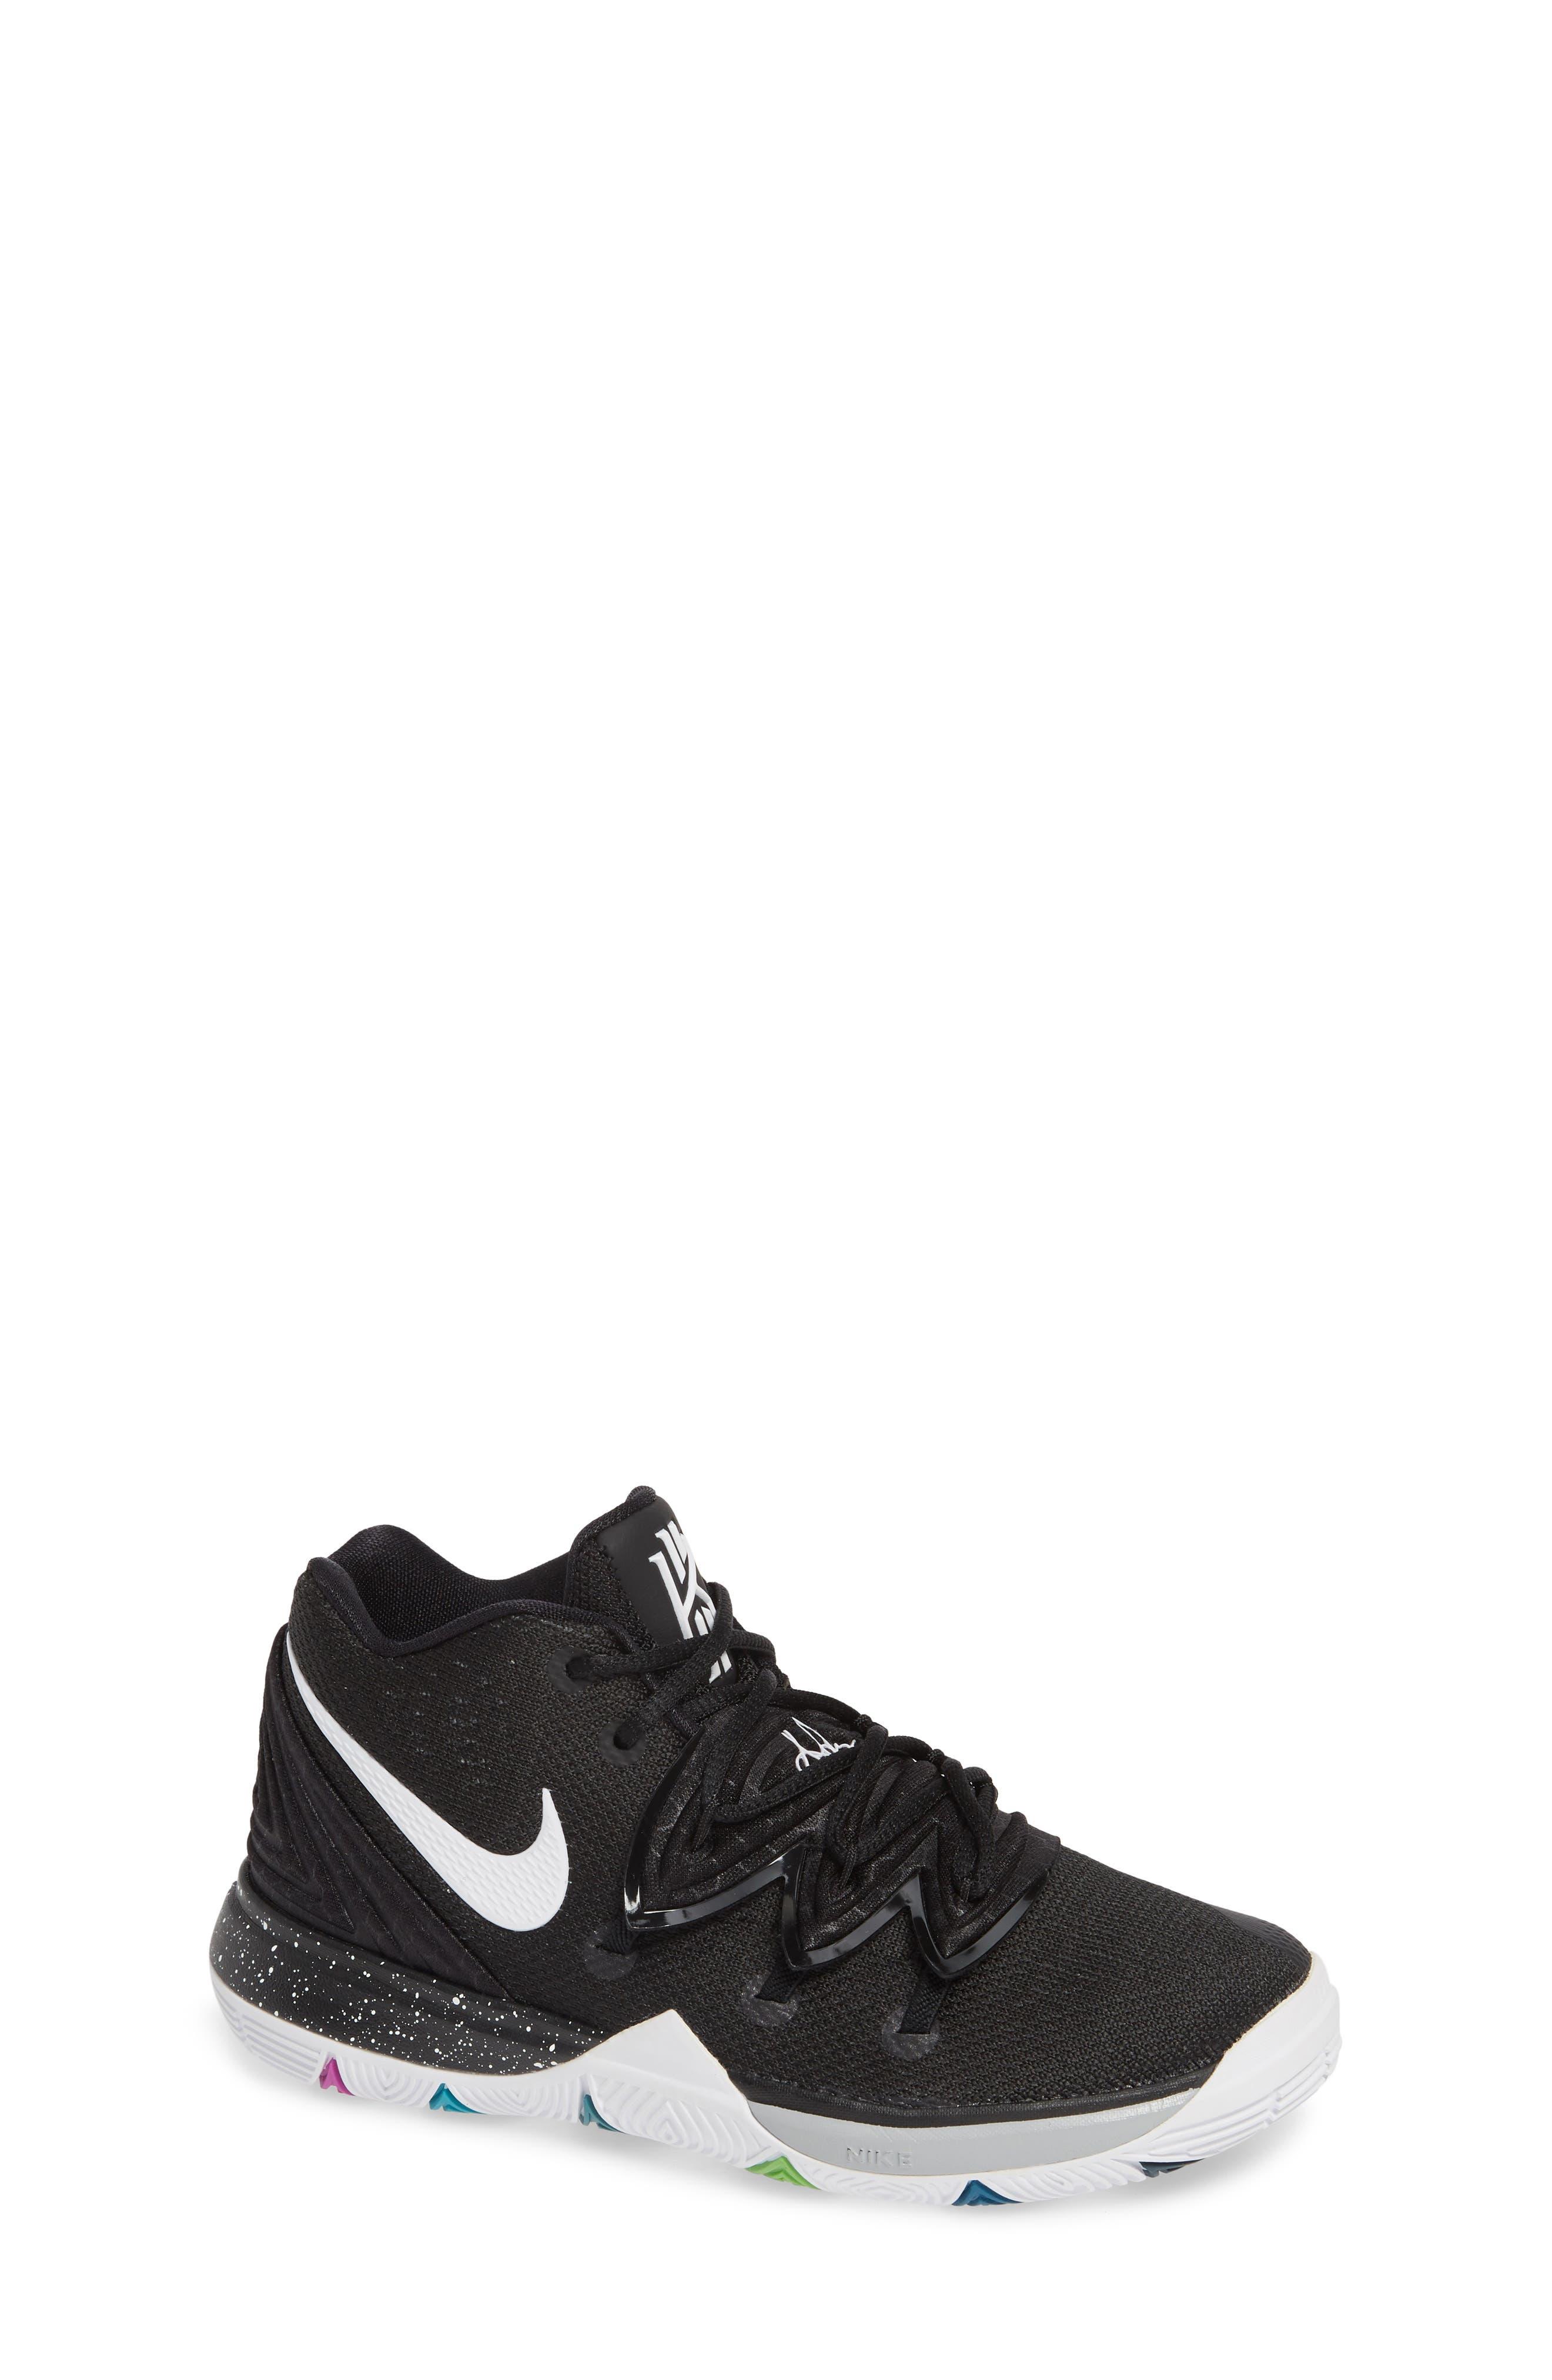 Nike Kyrie 5 Basketball Shoe (Toddler